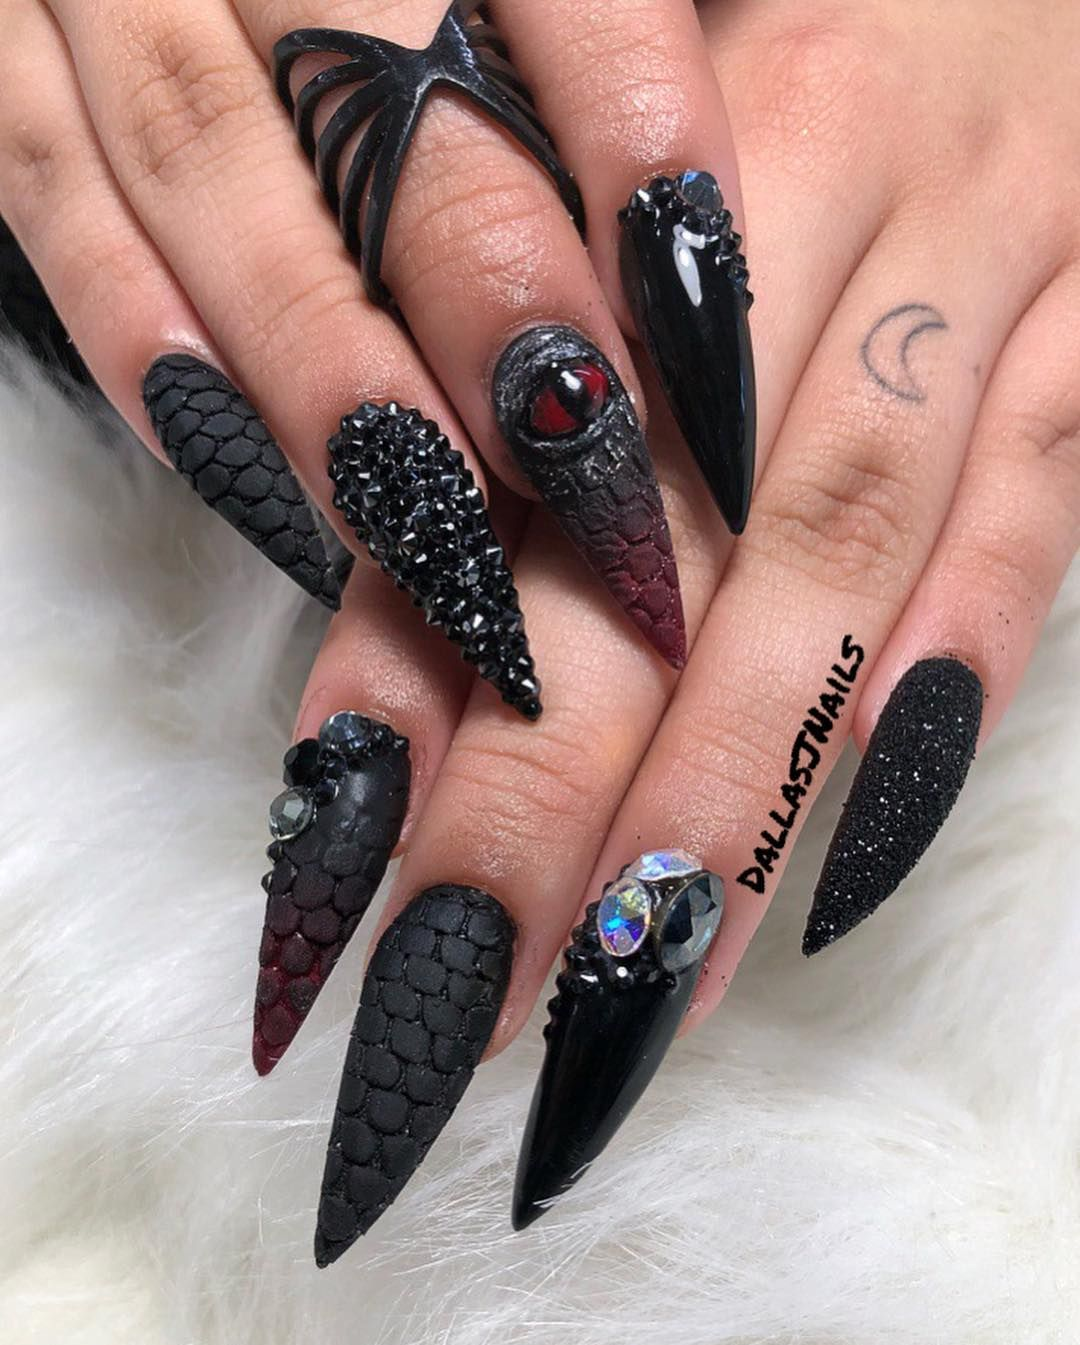 Dallasjnails On Instagram See No Evil Clients Request Dungeon Dragon Inspired Dallasjnails Nailart Sout Dragon Nails Goth Nails Gothic Nails